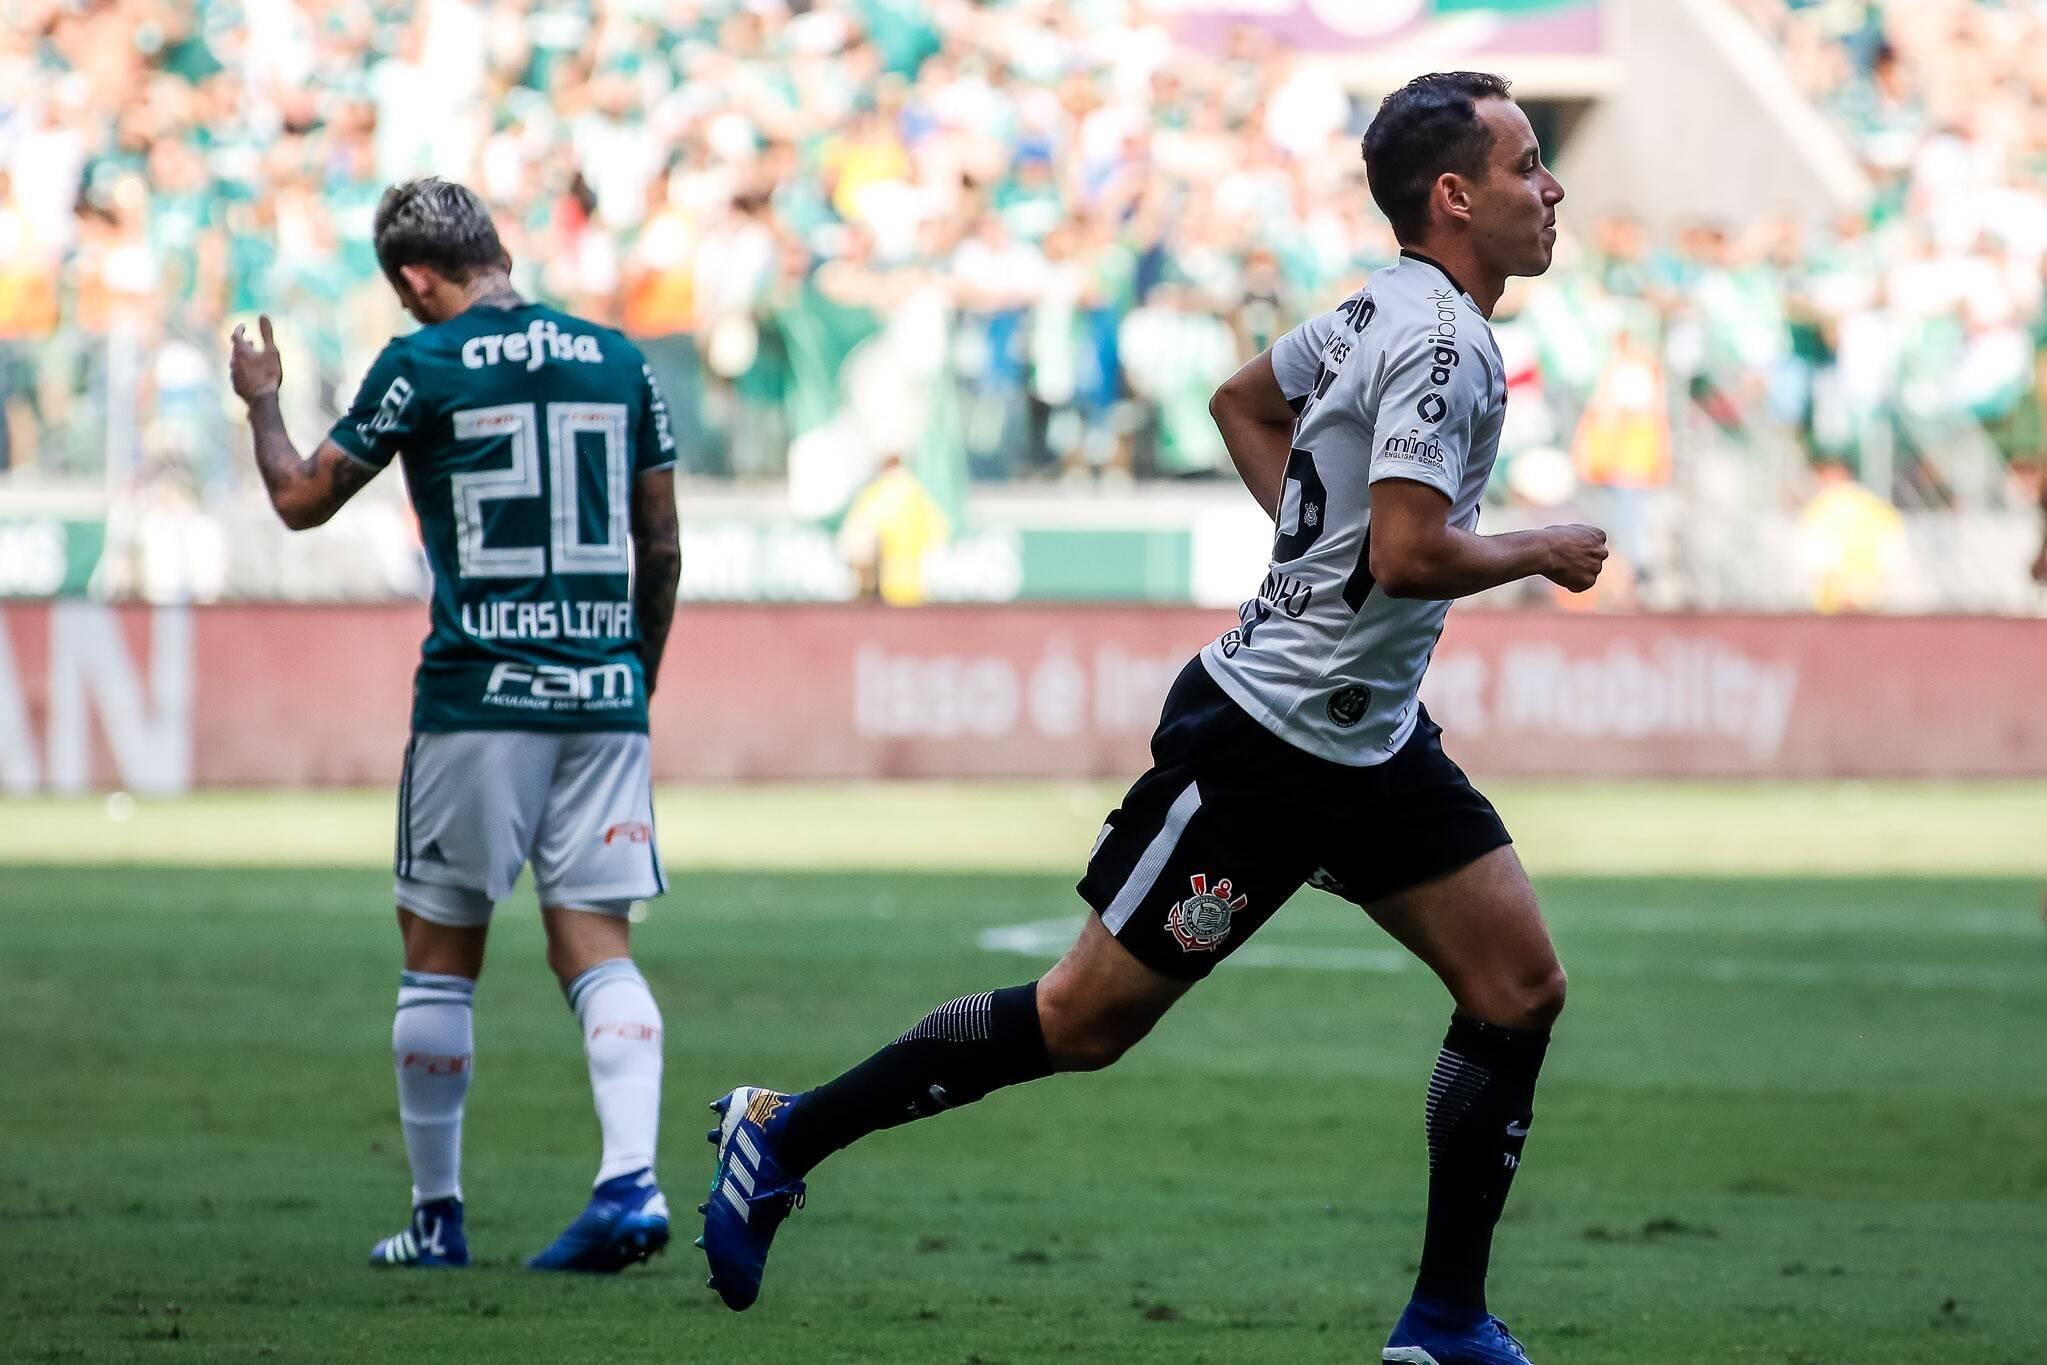 Foto: Rodrigo Gazzanel/Ag. Corinthians